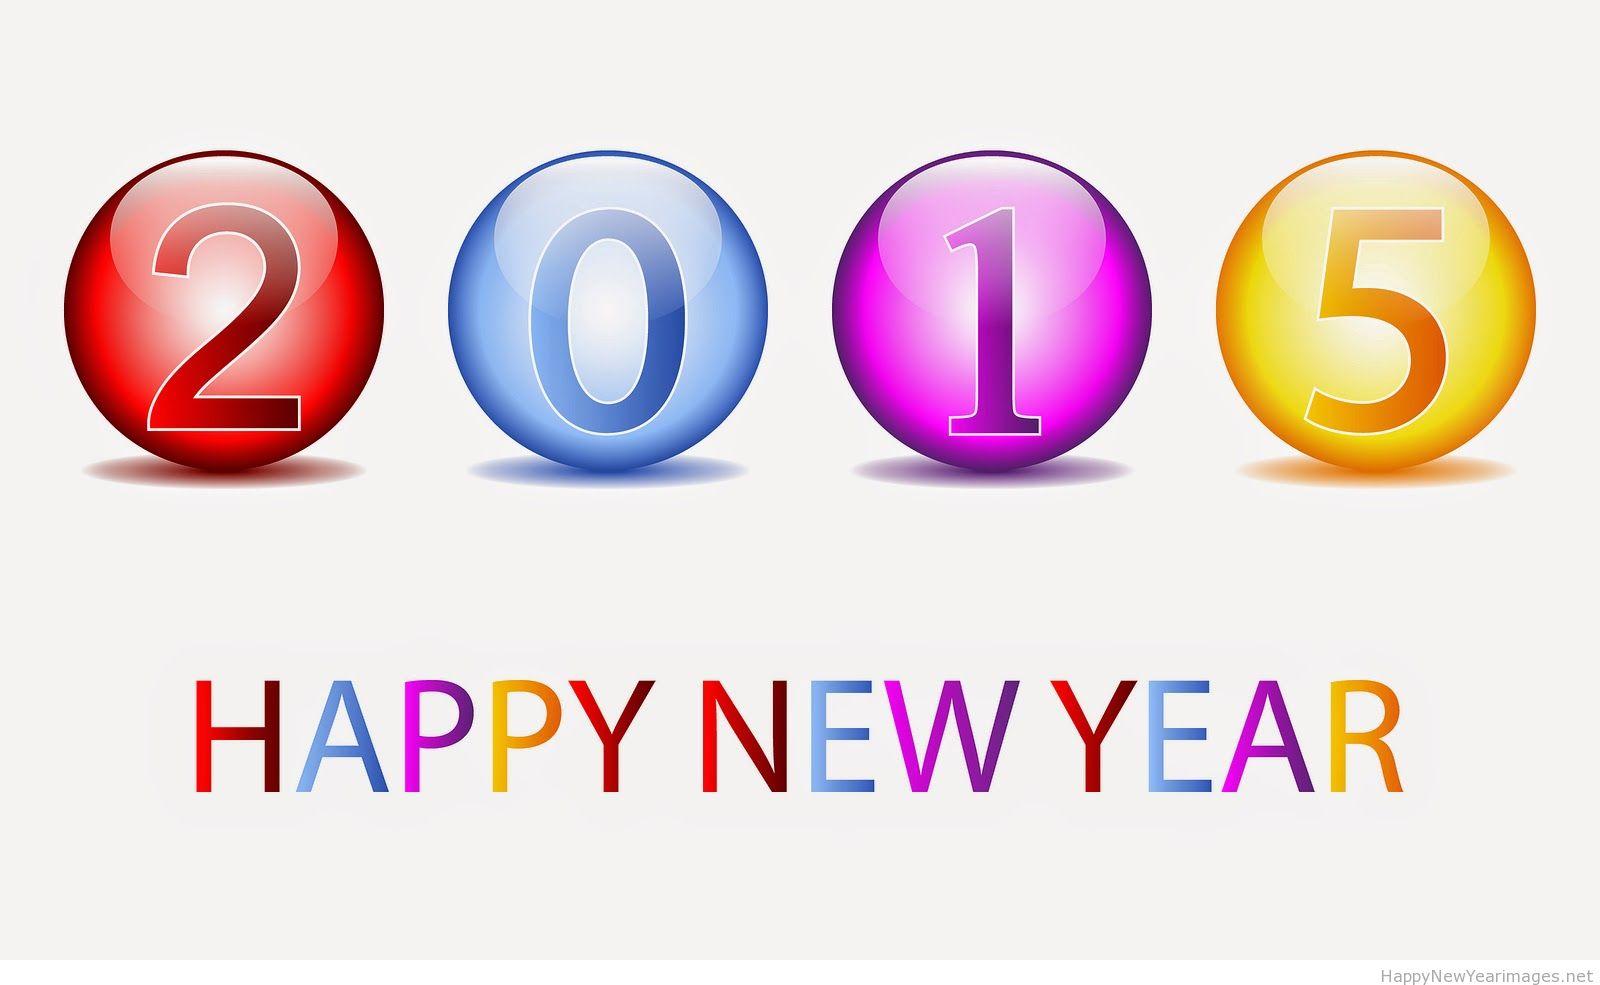 Happy New Year Banner Clip Art - ClipArt Best